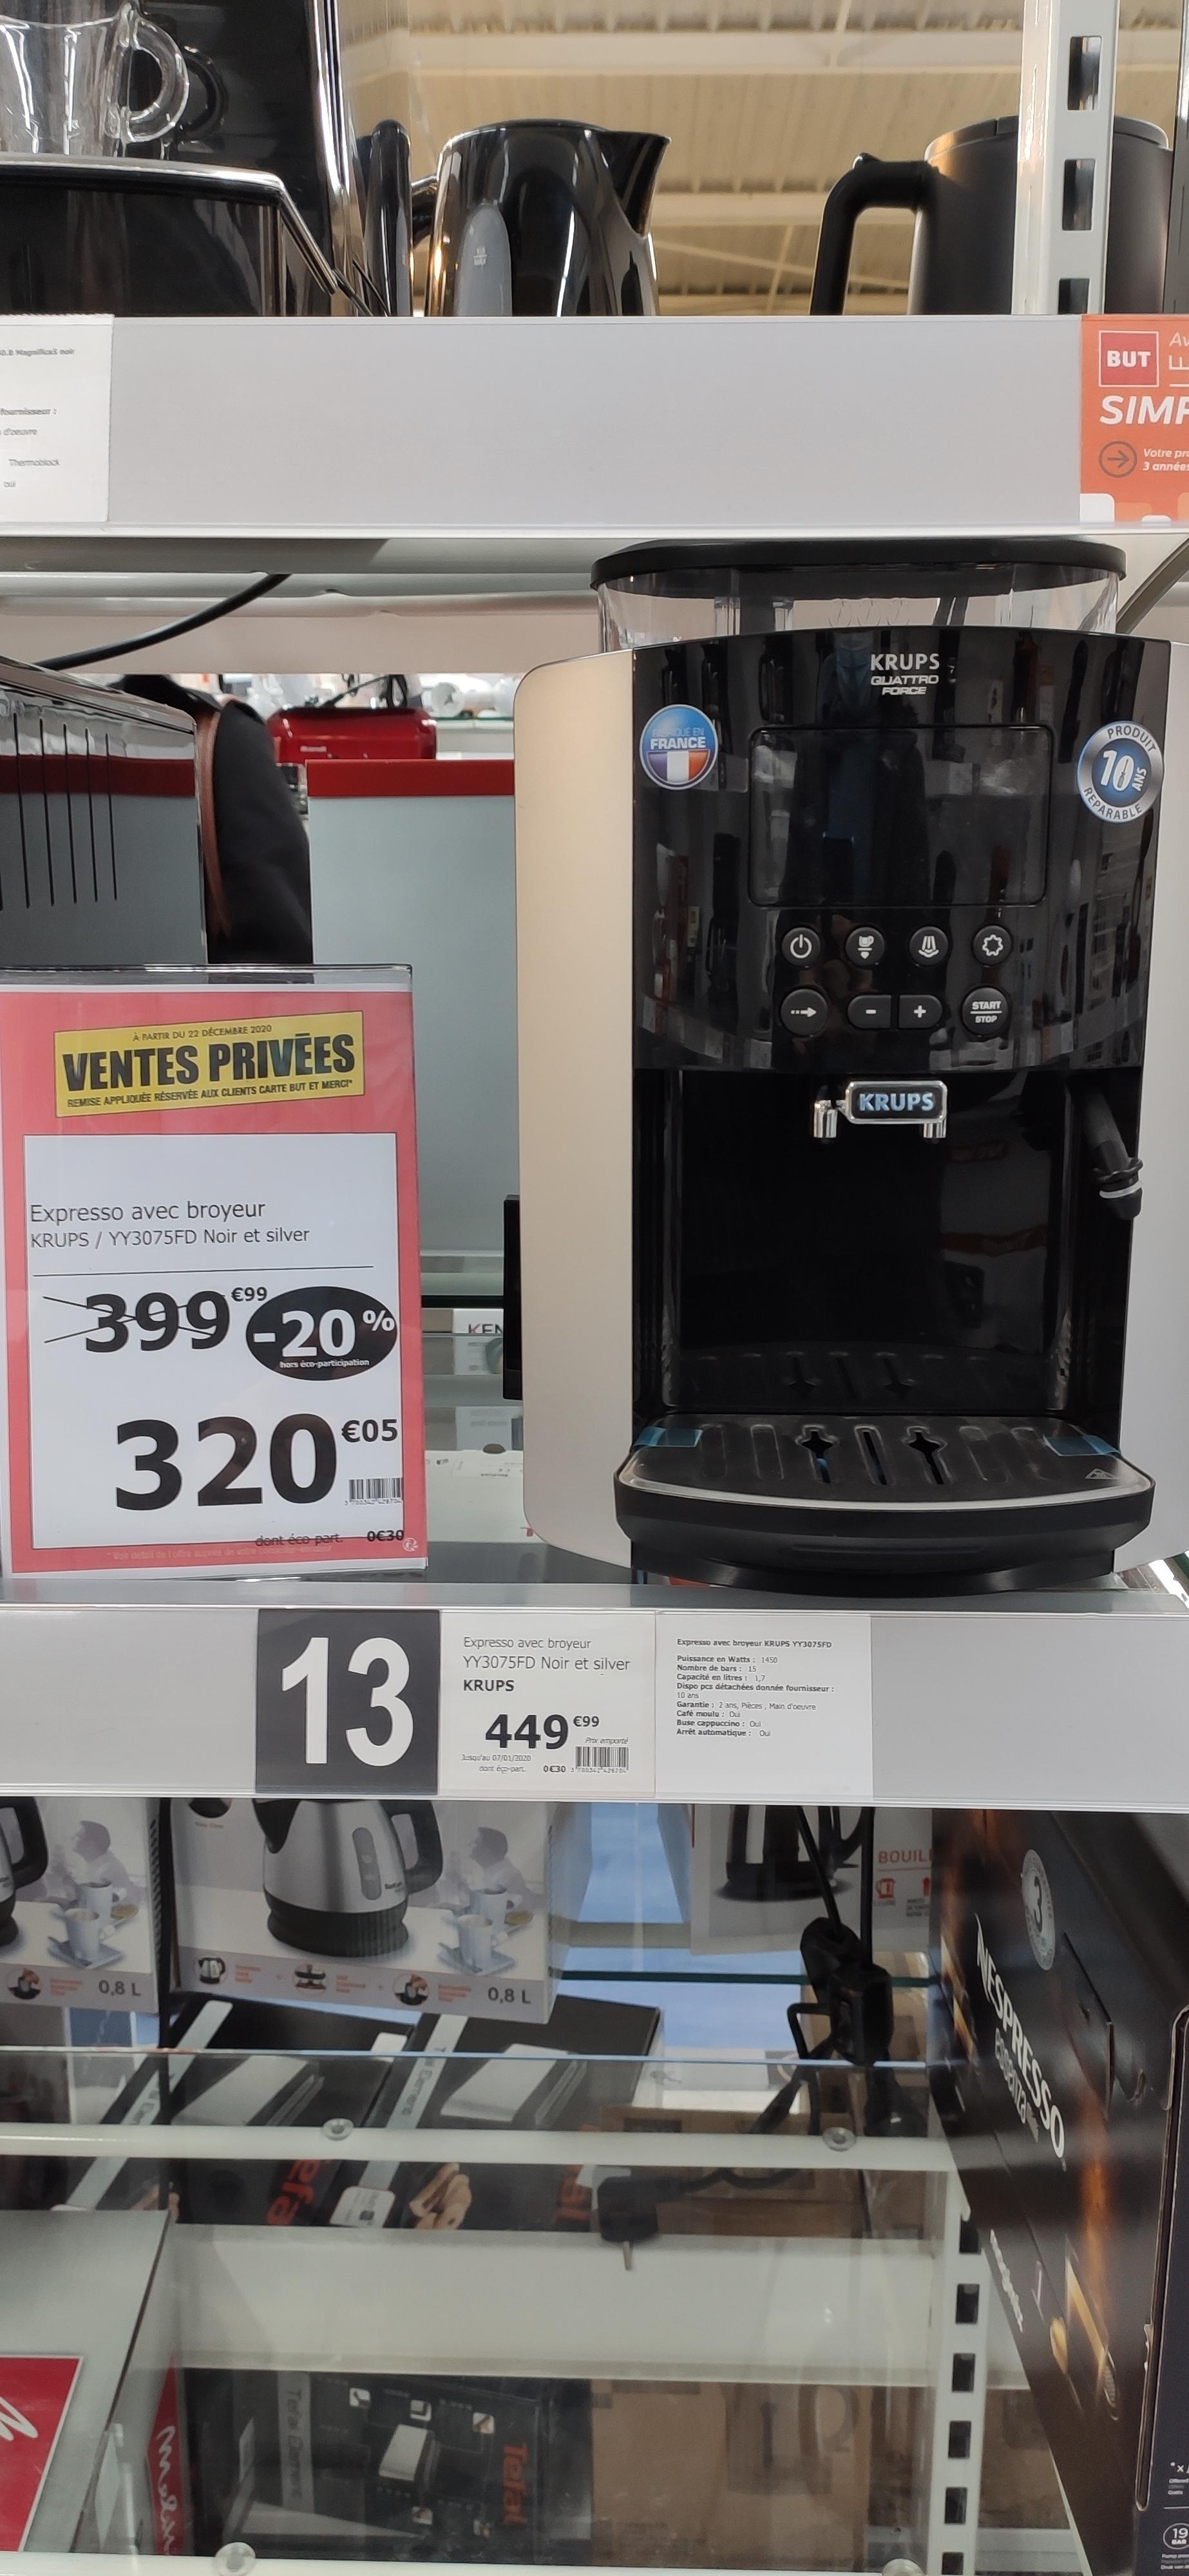 Machine à Expresso avec broyeur Krups YY3075FD (Via ODR de 40 €) - Nemours (77)